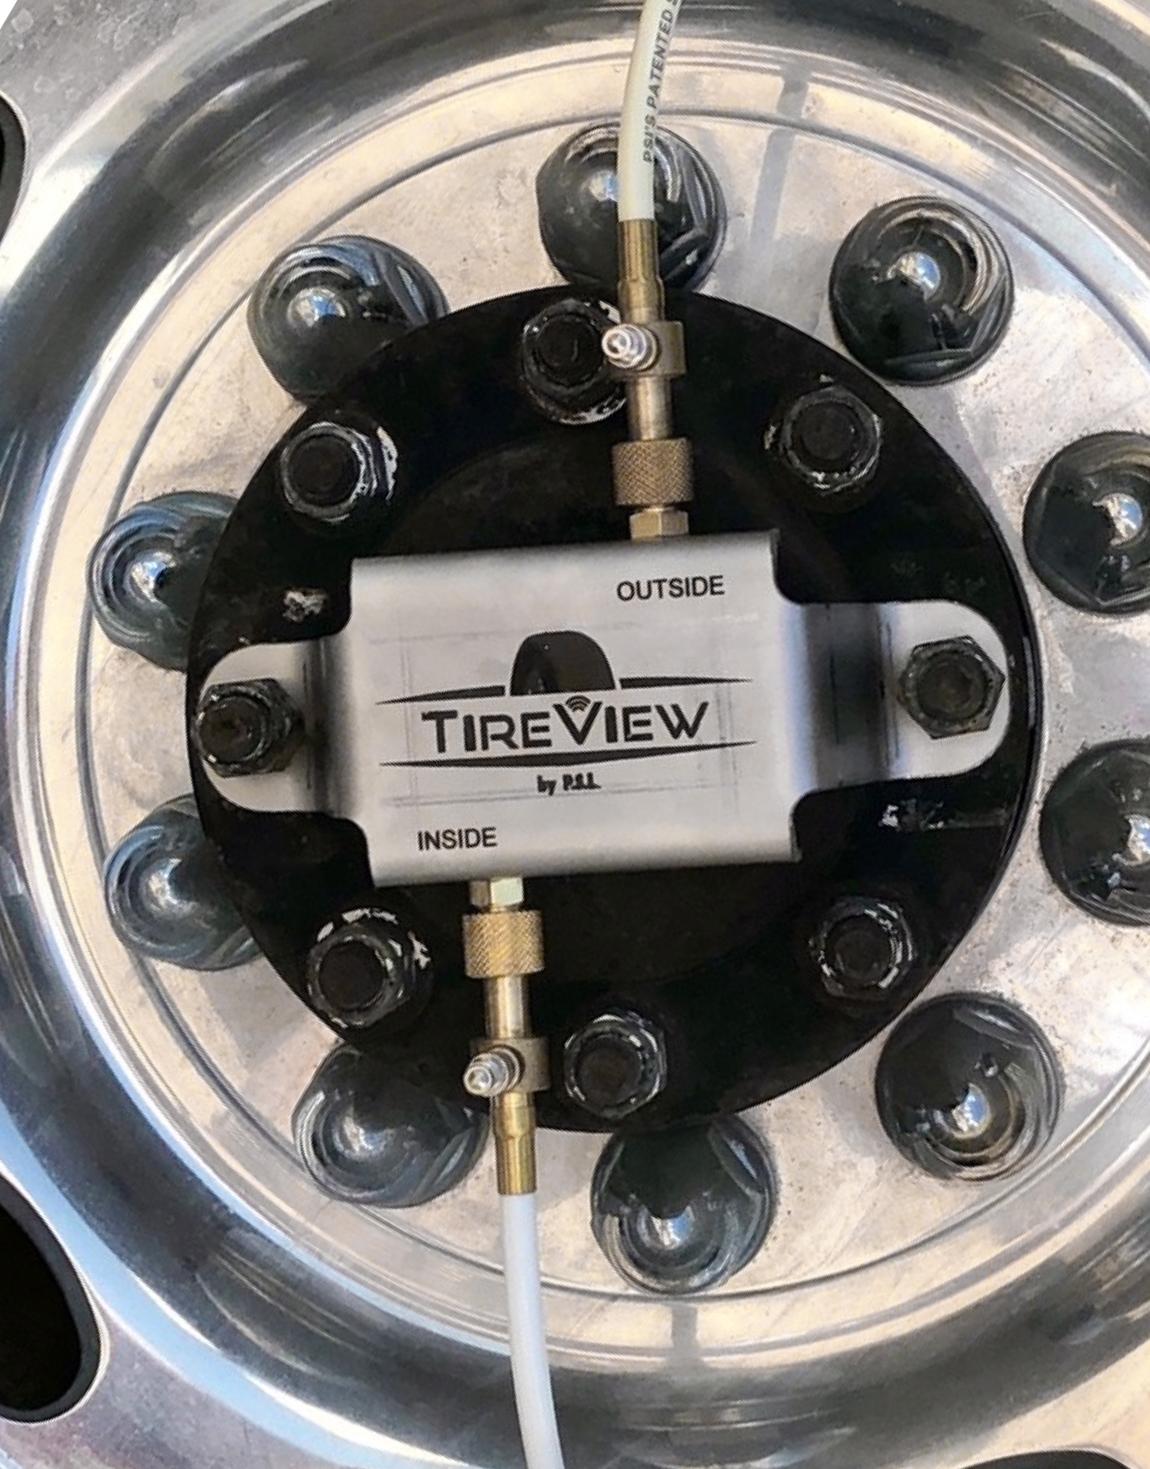 P.S.I. Adds Tire Pressure Management